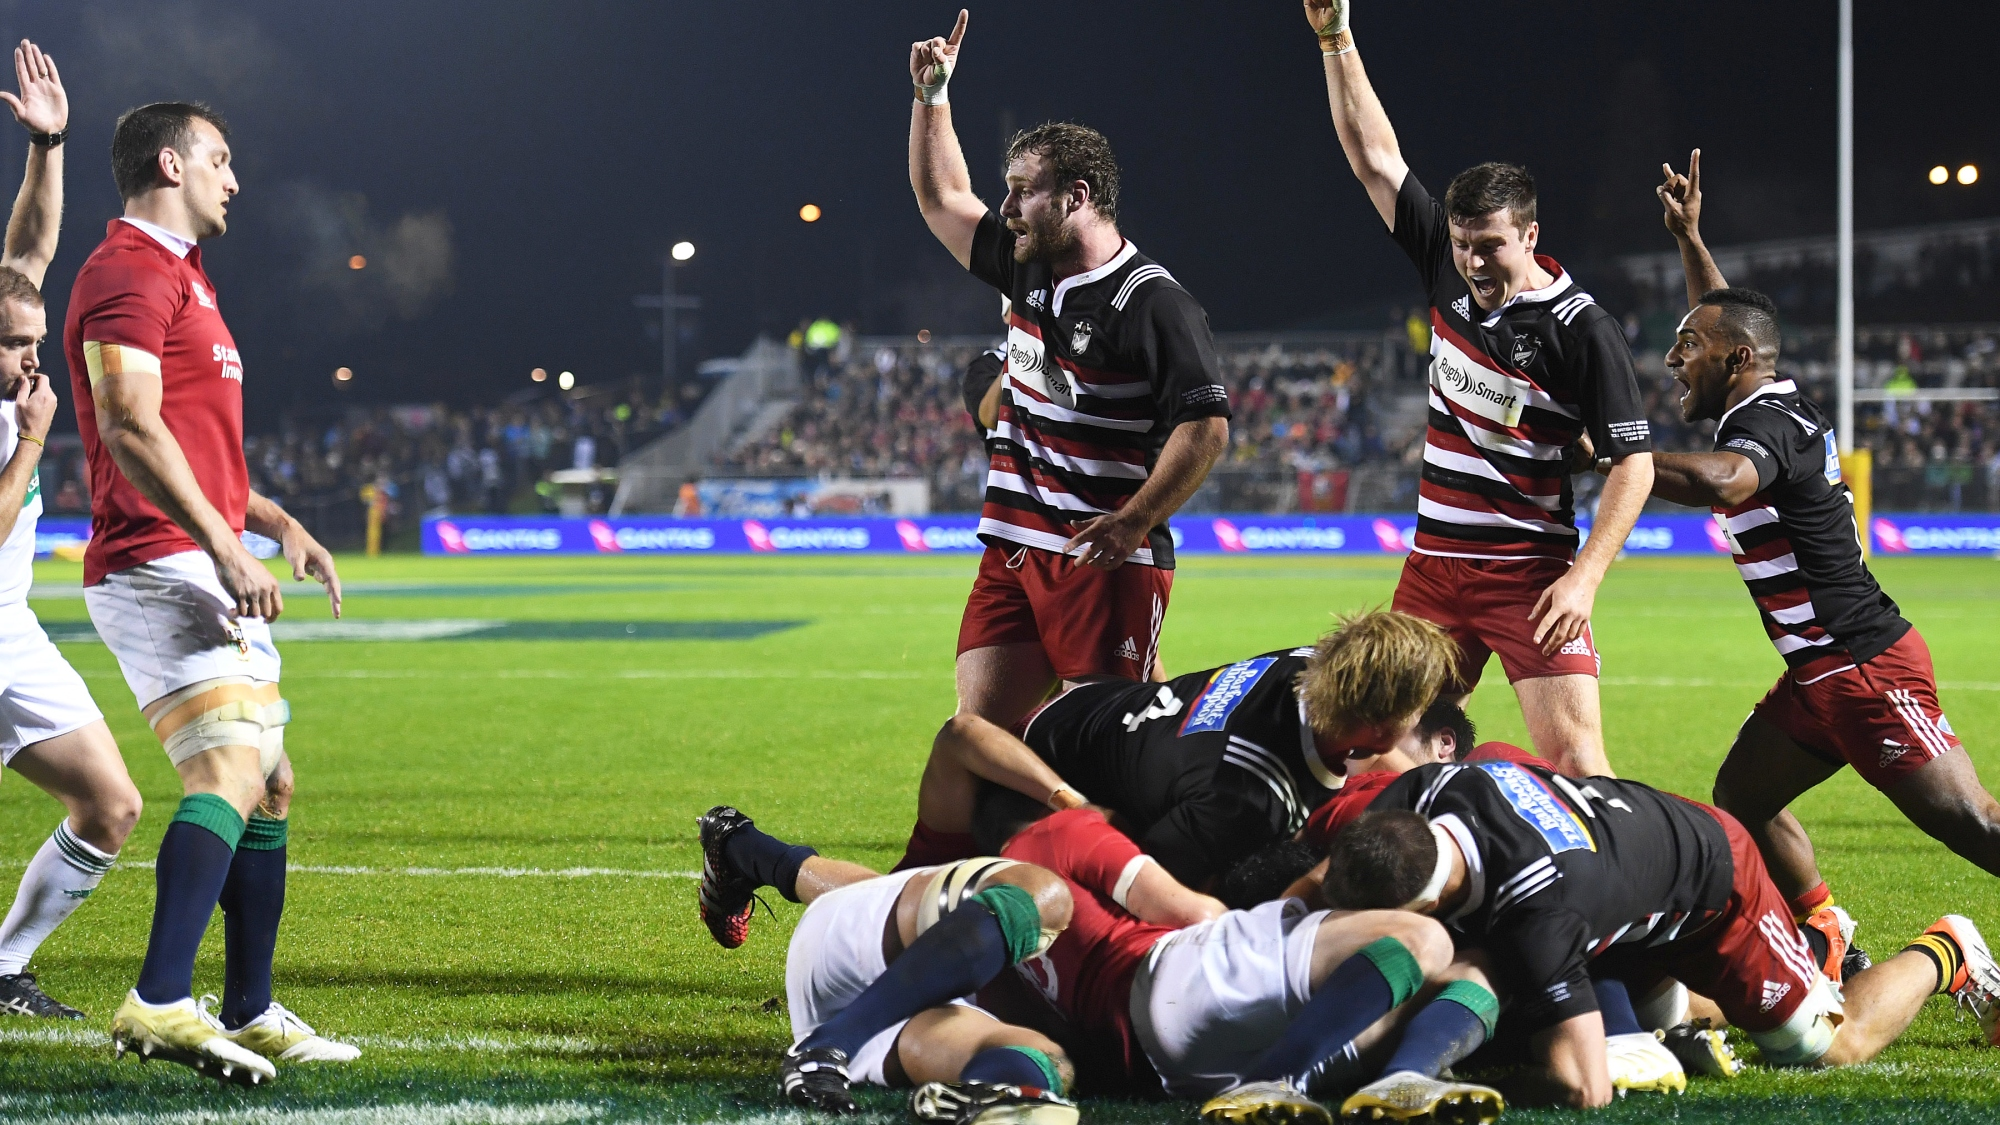 McMillan delighted with Barbarians attitude despite loss